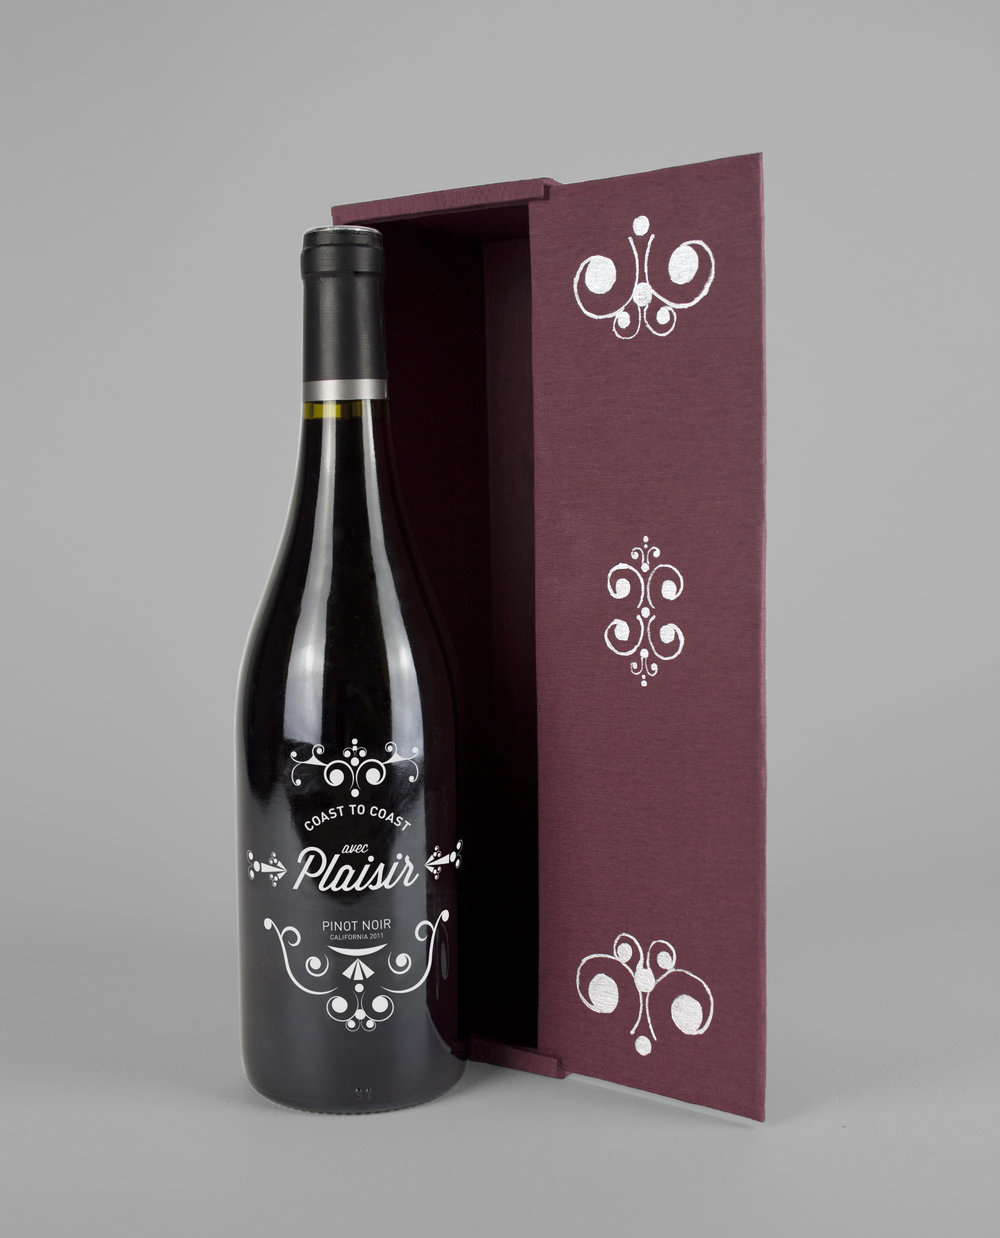 Krys-Ha-Avec-Plaisir-Packaging-2